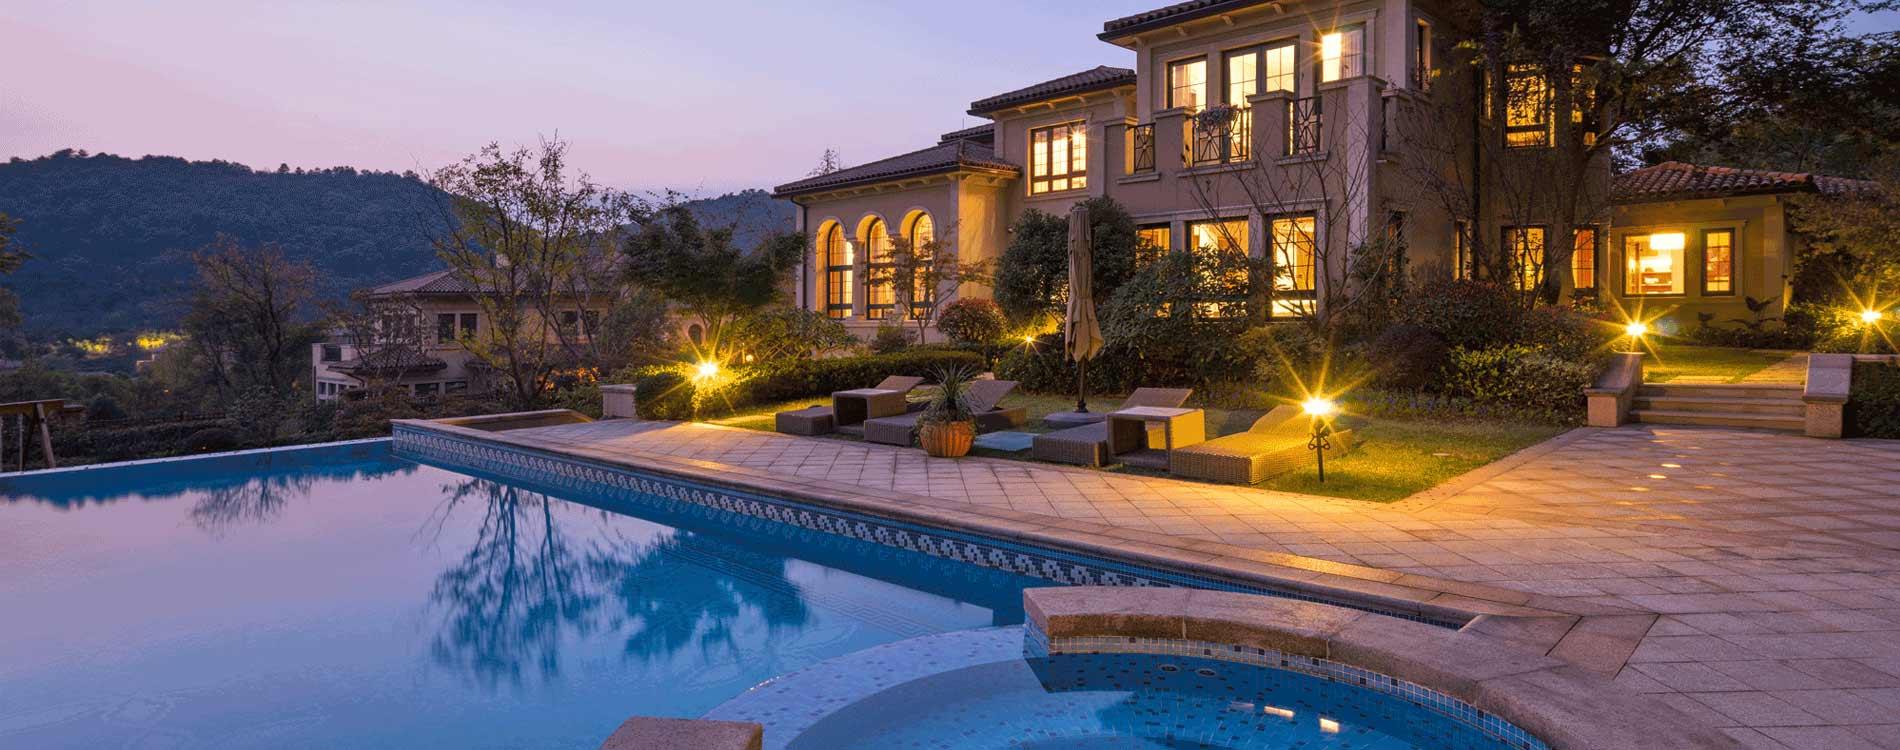 monica barkley santa clarita real estate expert